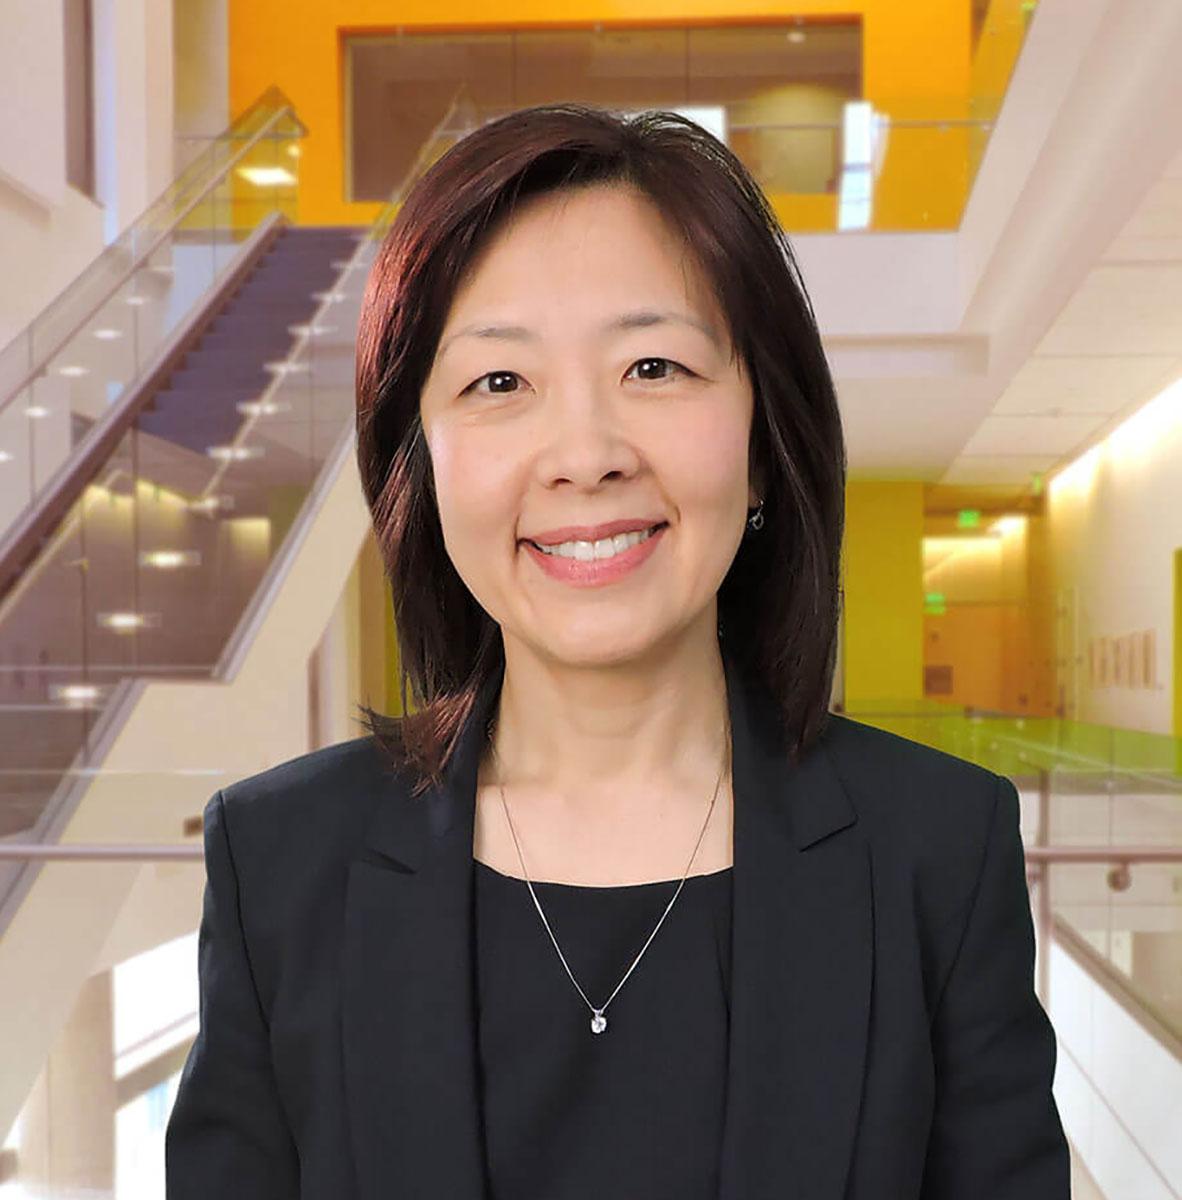 Dr Catherine Park